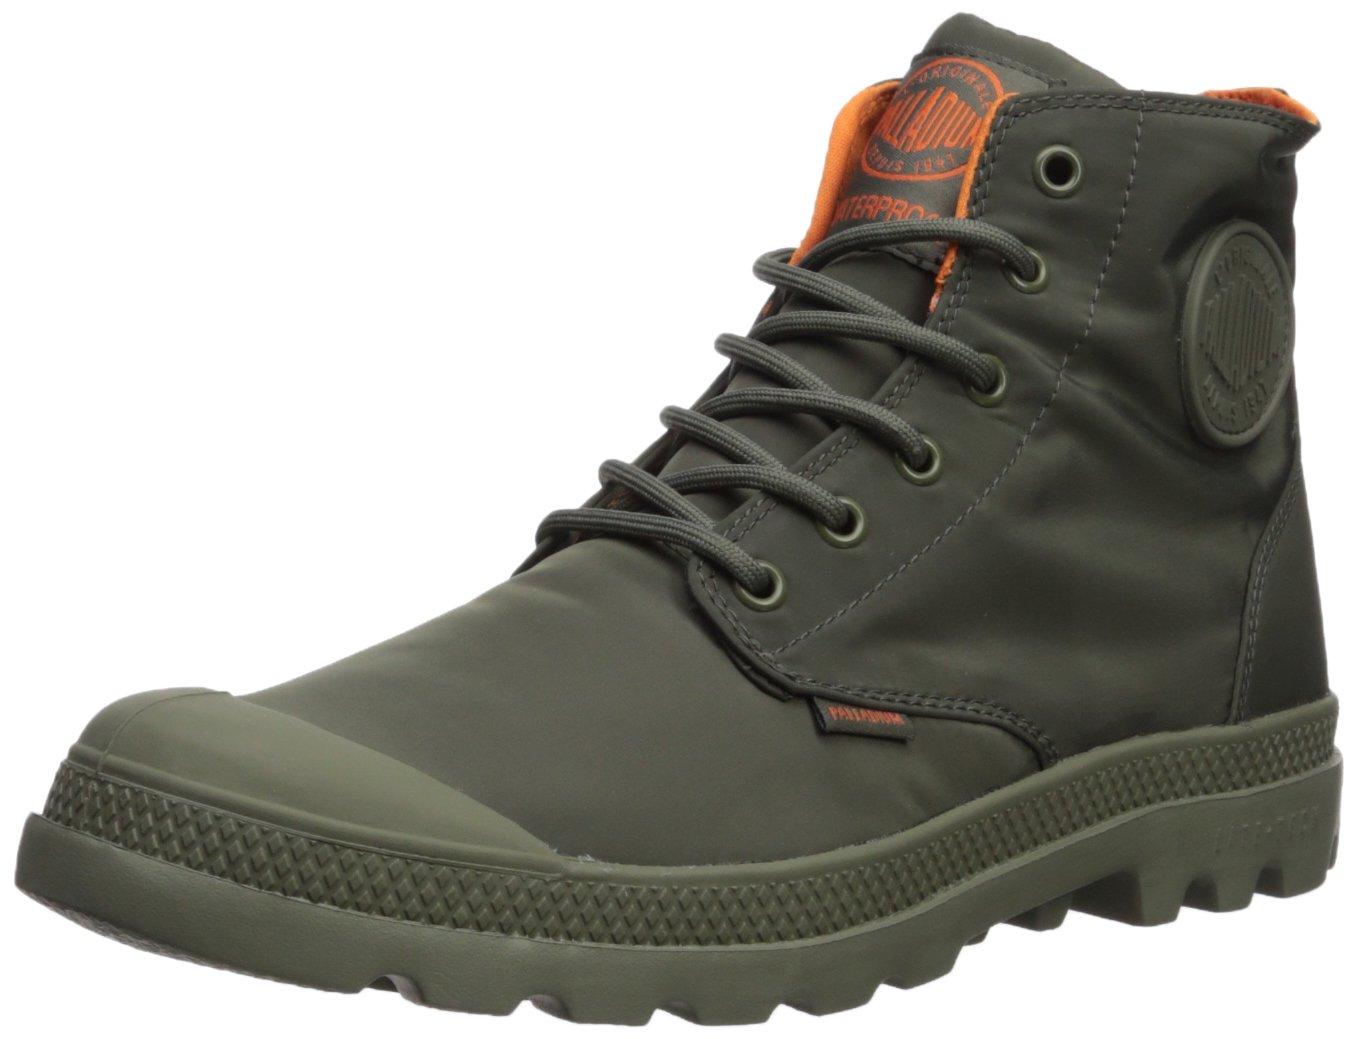 Palladium Unisex Puddle Ankle Boot B074P8FKSC 12 B(M) US|Green